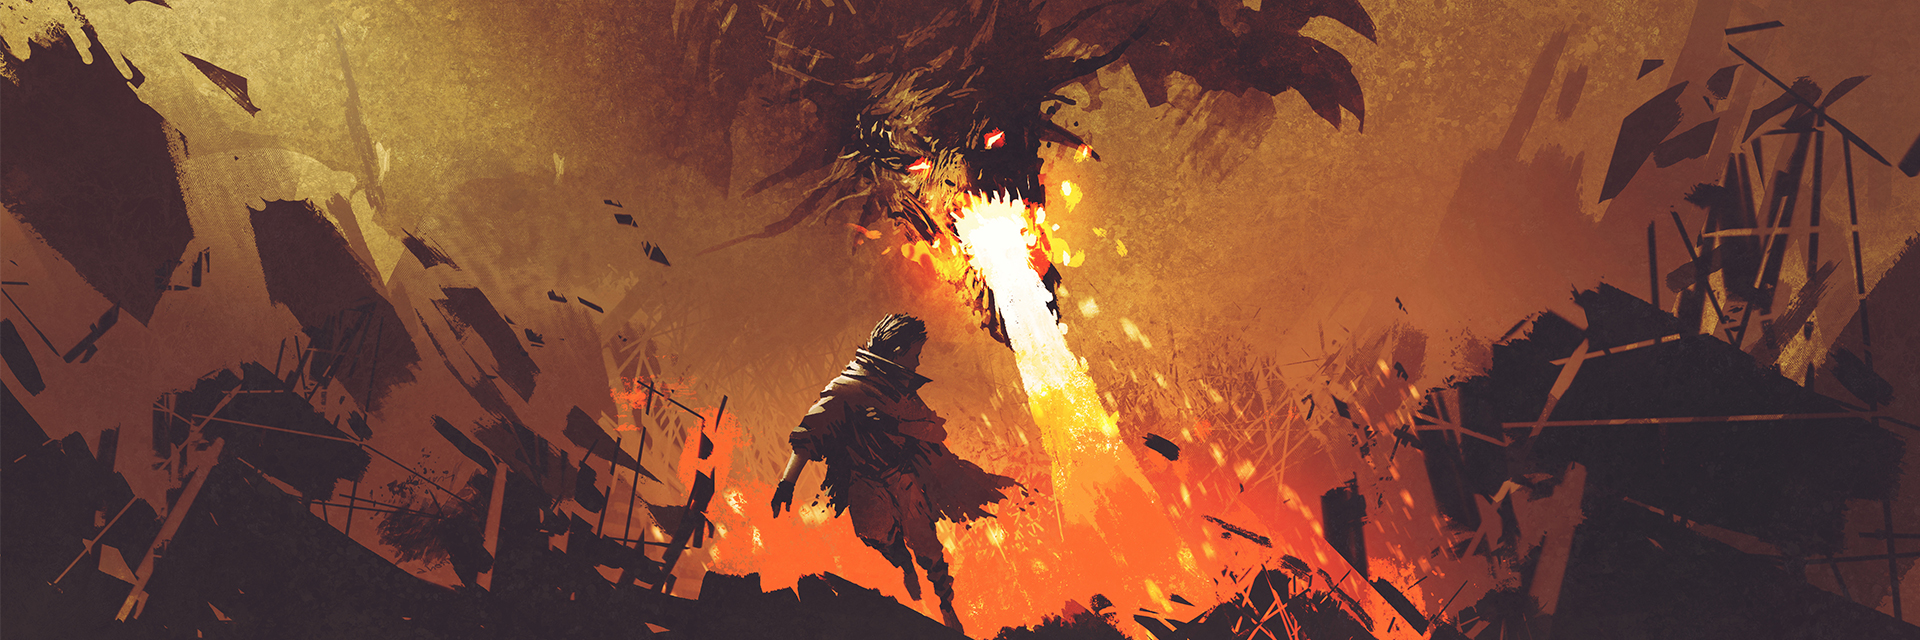 Dragon Fire Boy Running